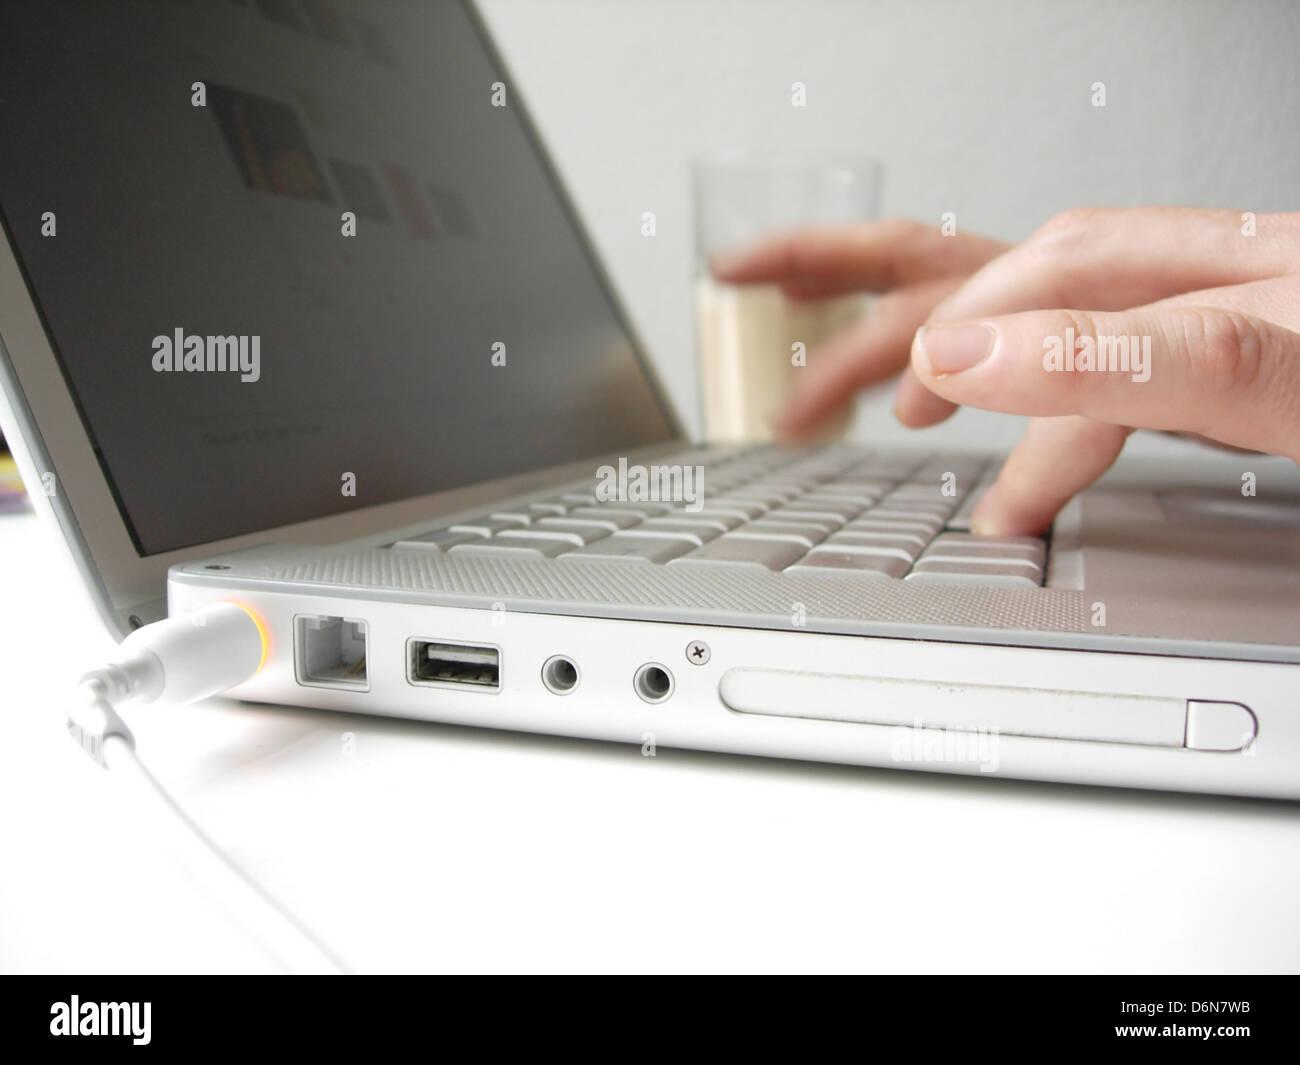 palmtop,finger,typing - Stock Image